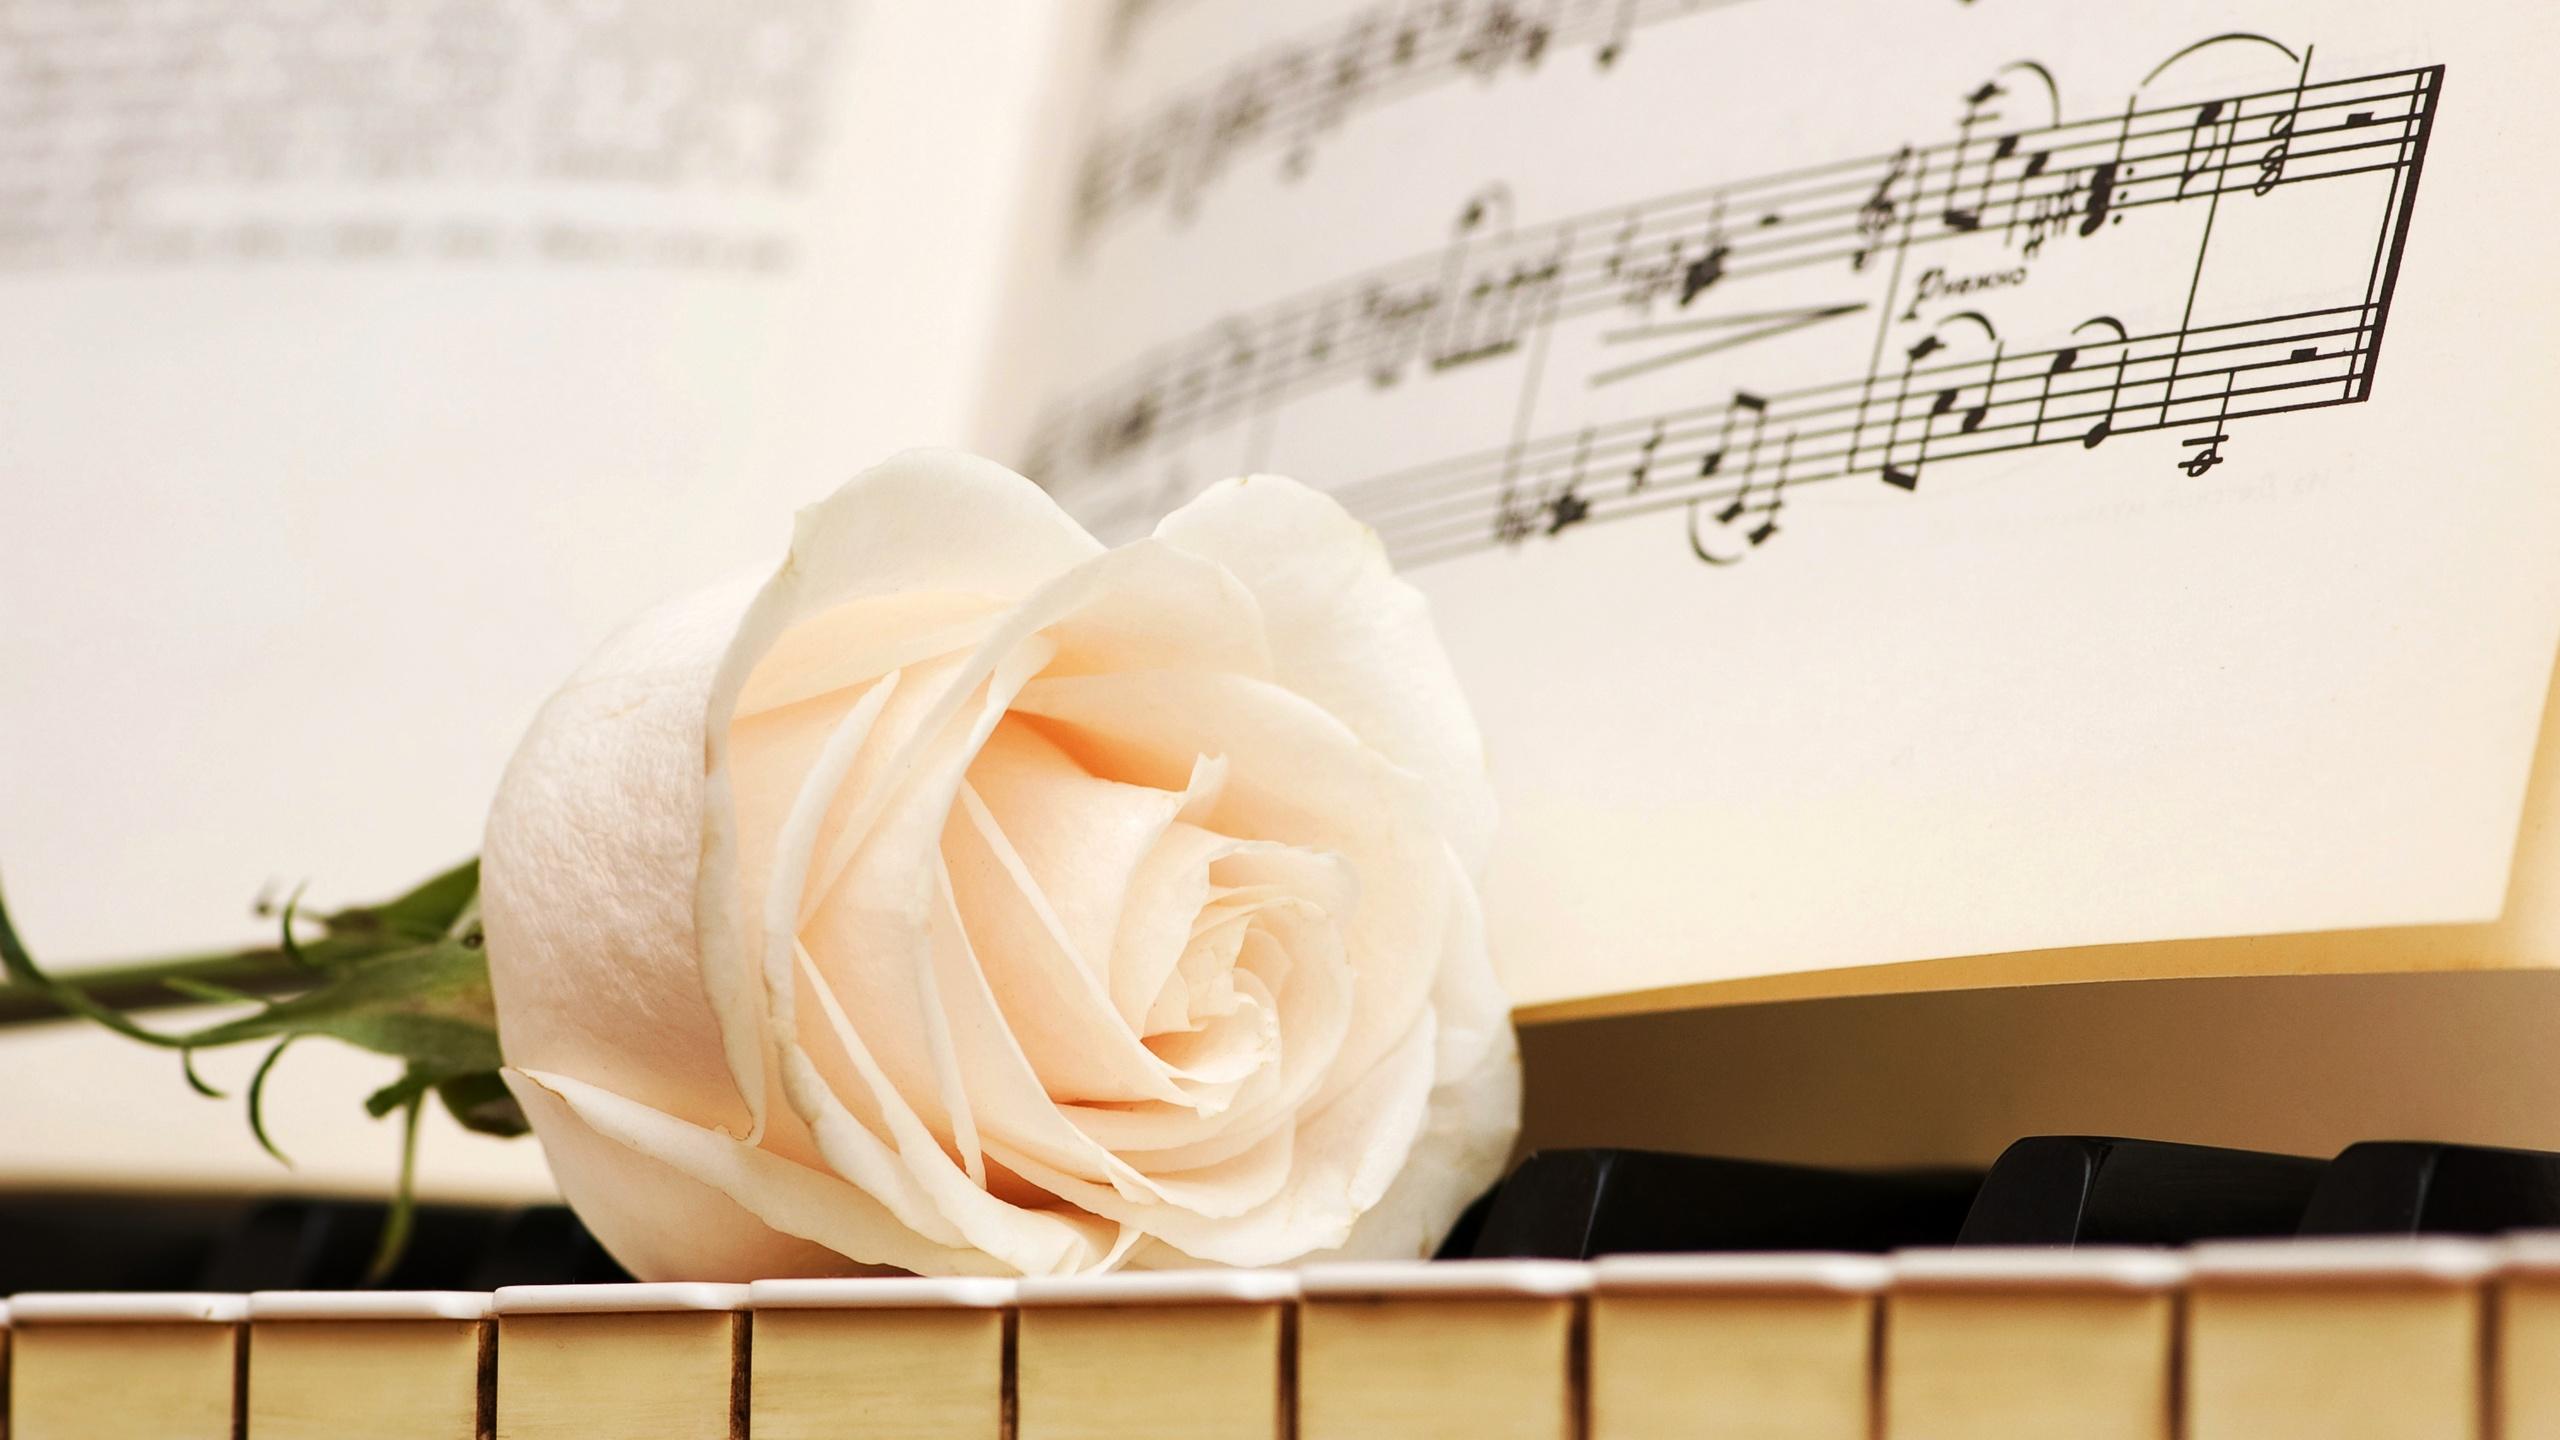 Ноты и пианино картинка